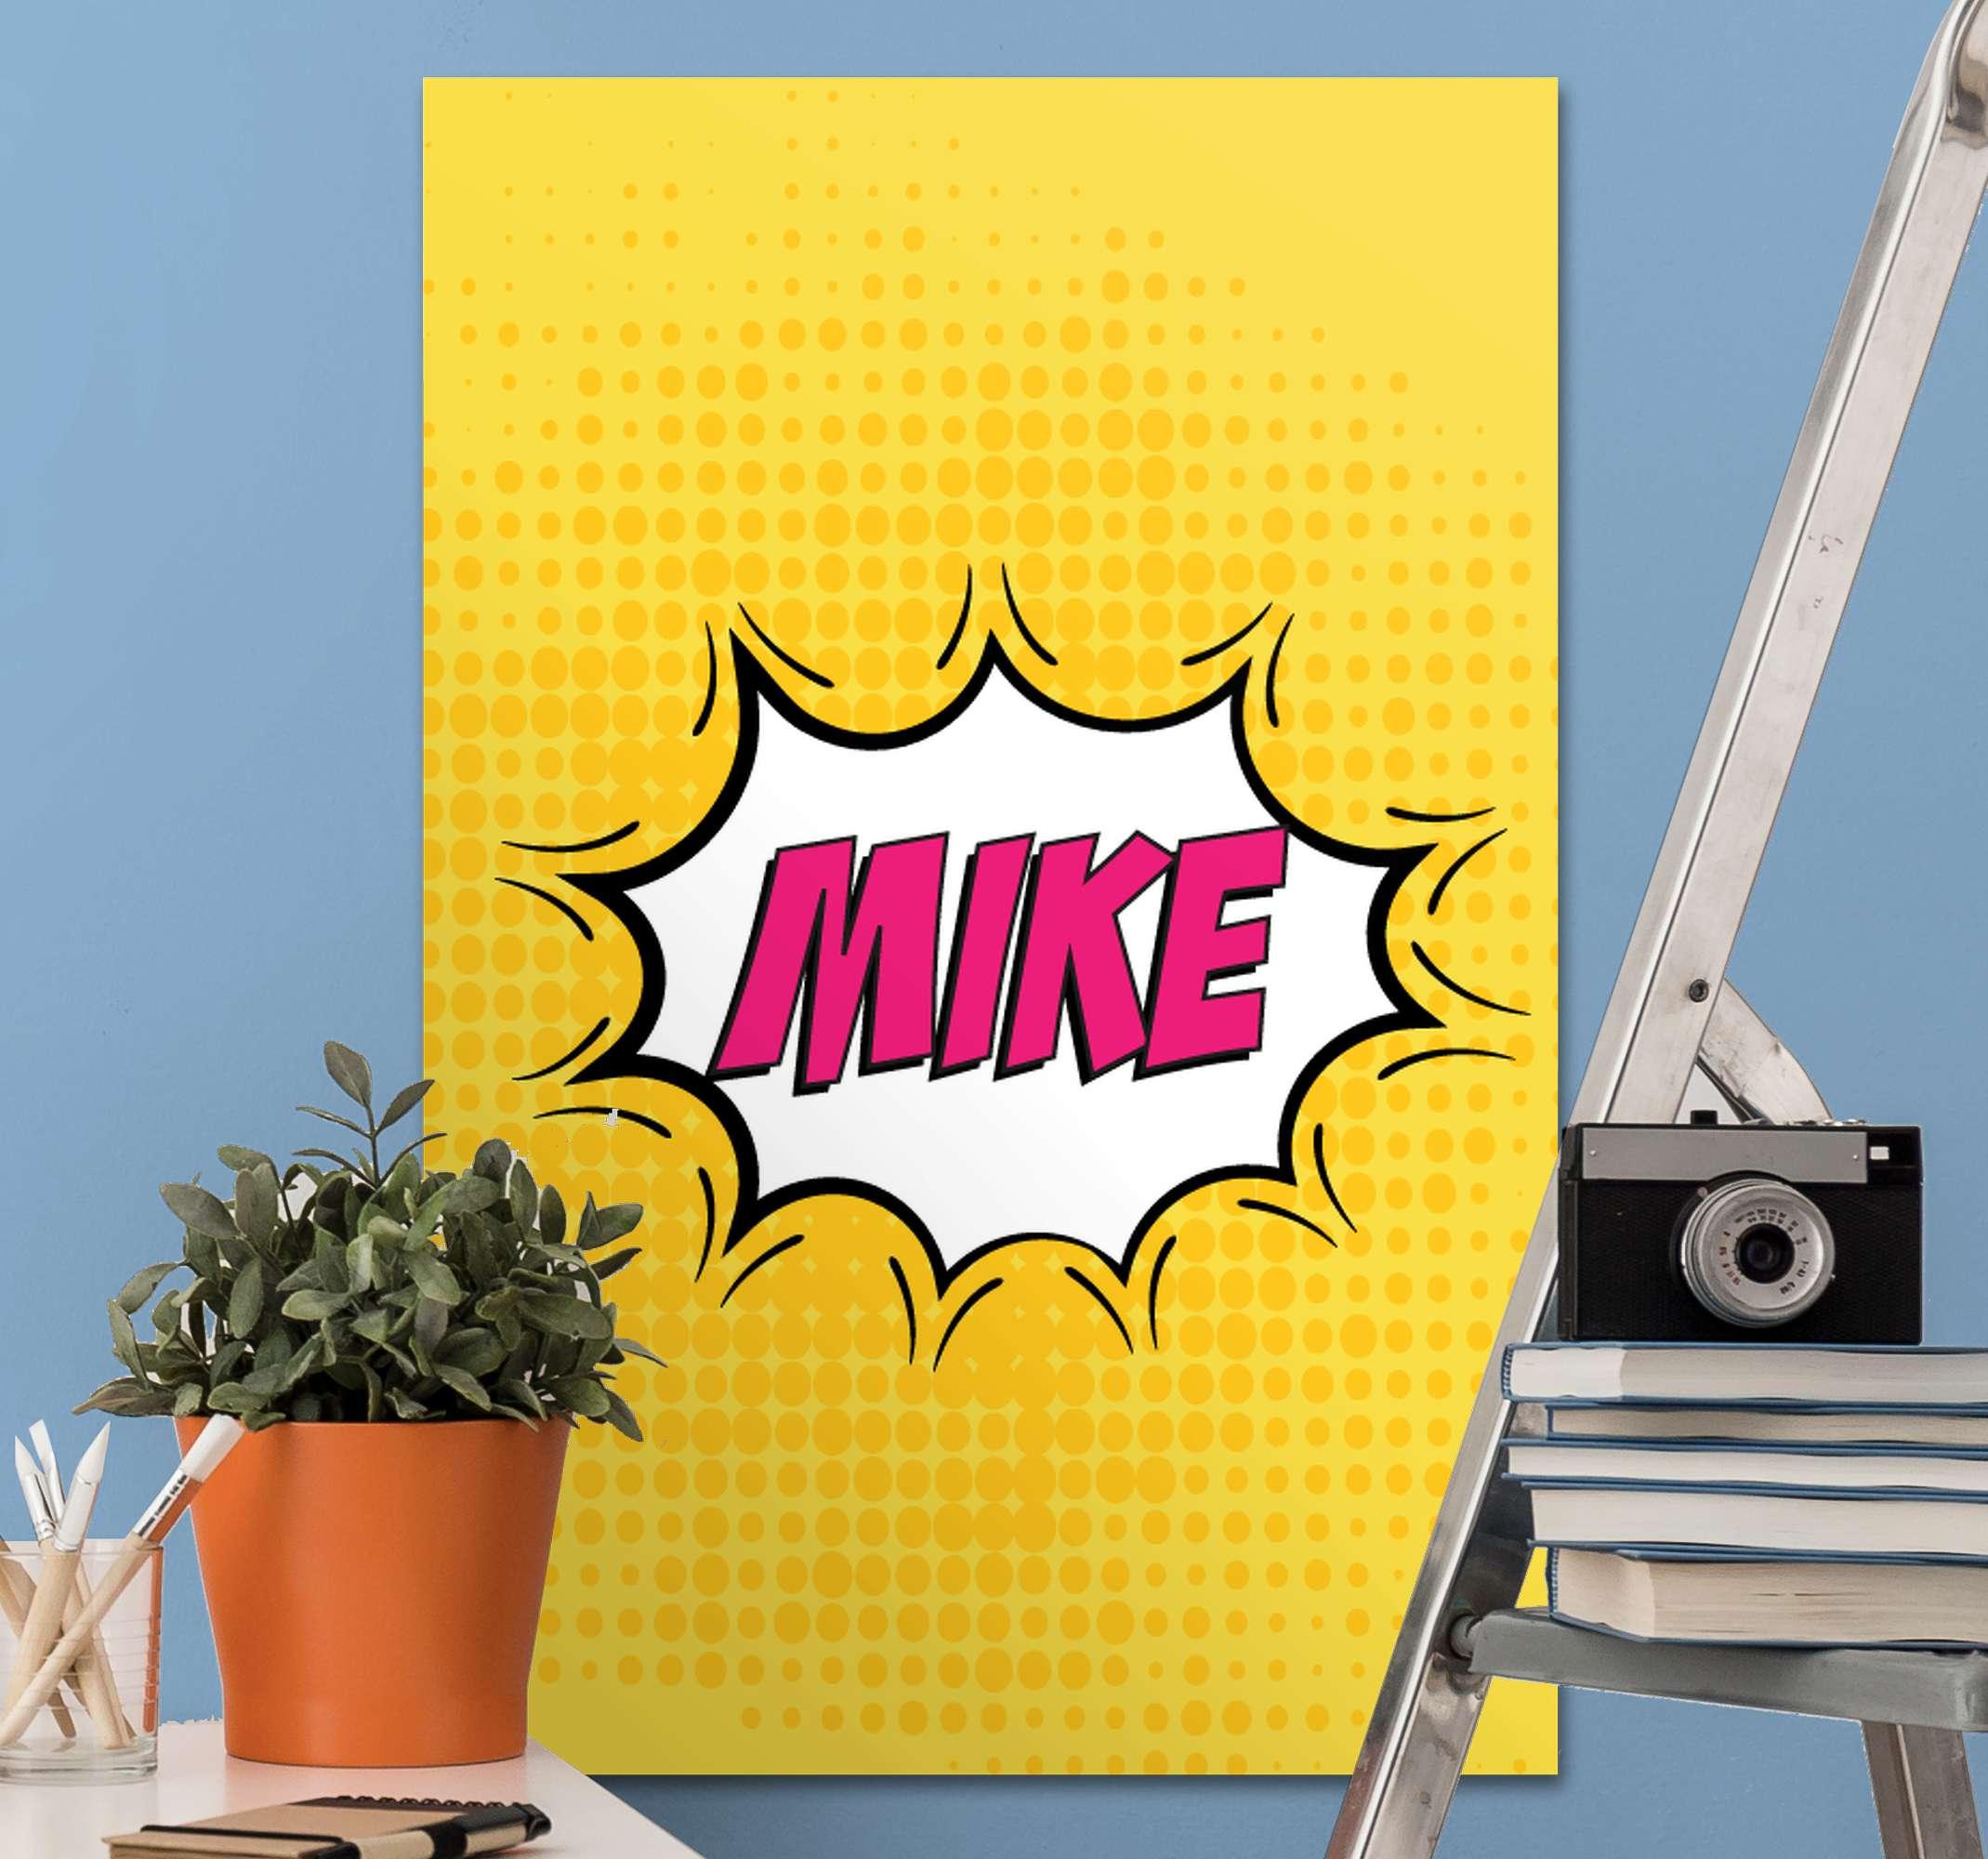 TenStickers. 漫画书名称可定制的帆布版画. 这款漫画书可自定义的画布打印图在您家里的任何房间里看起来都很棒!通过添加您自己的名字进行个性化设置。